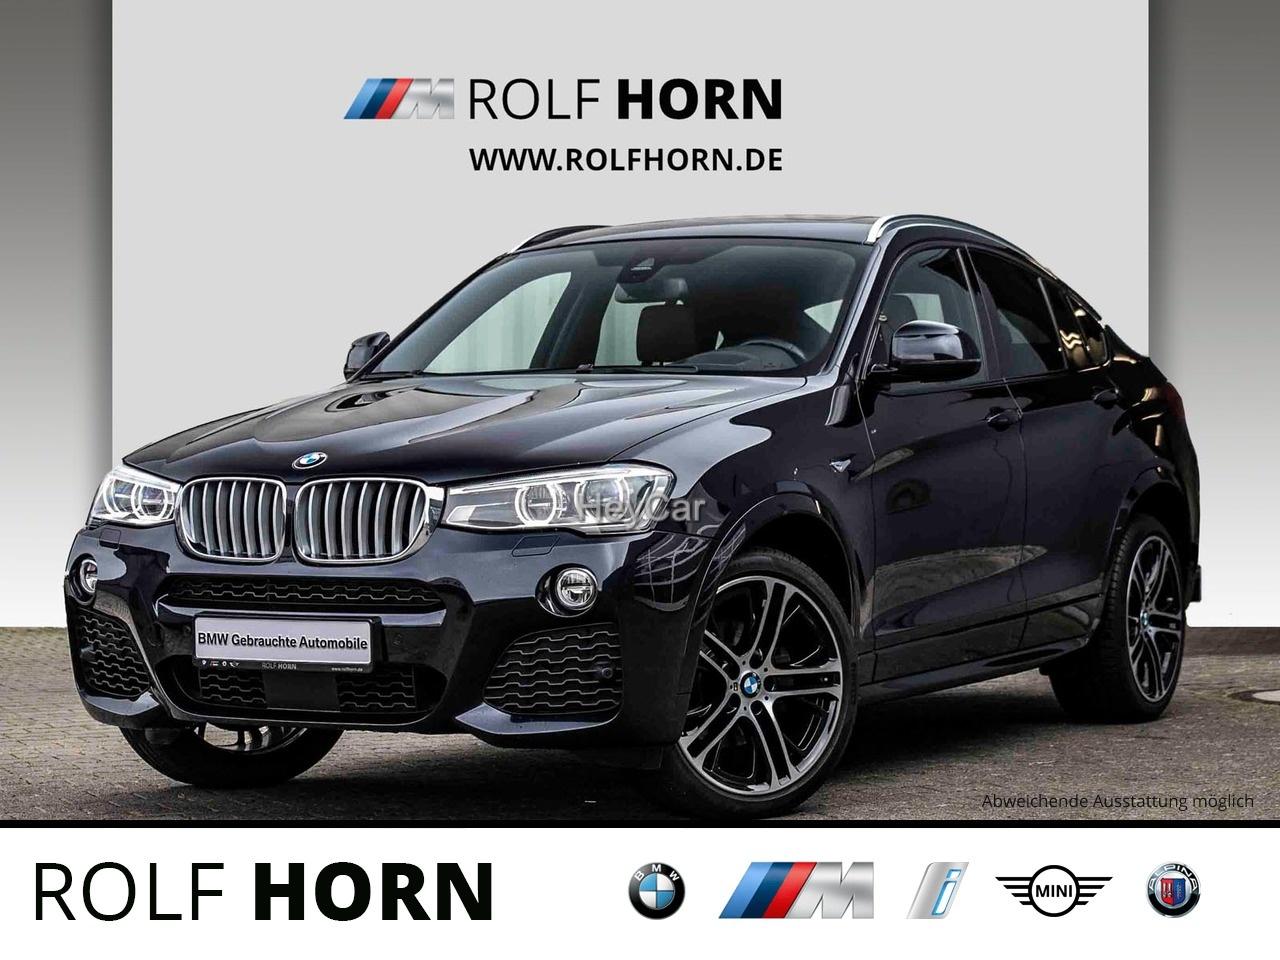 BMW X4 xDrive35dA M Sportpaket Navi AHK Glasdach HUD, Jahr 2016, Diesel